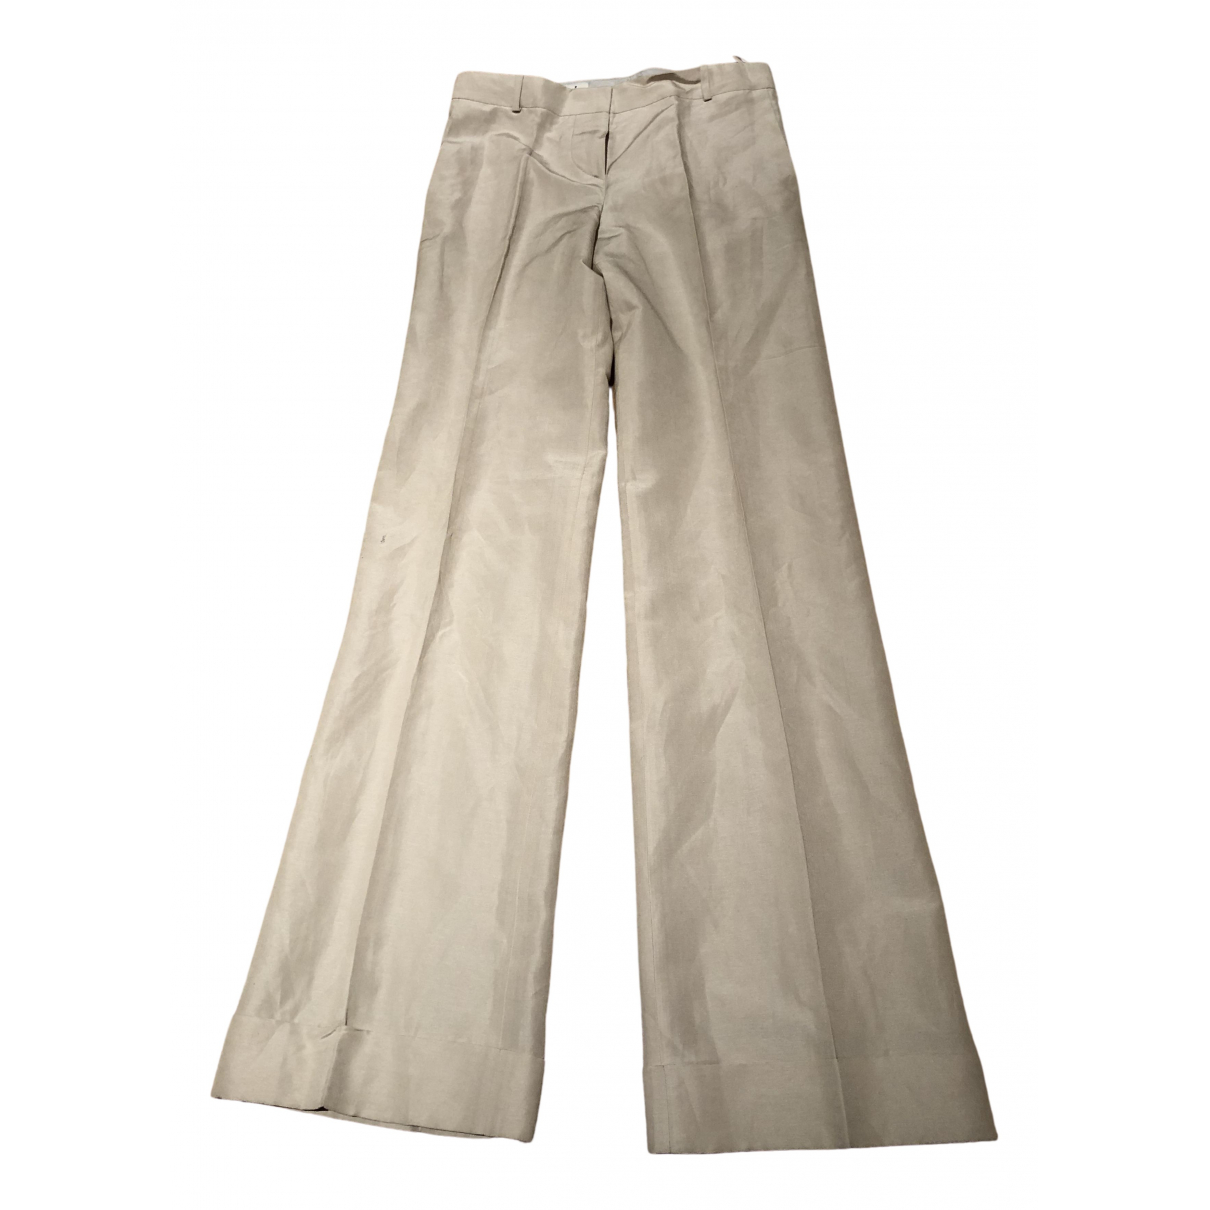 Chloé \N Ecru Linen Trousers for Women 36 FR